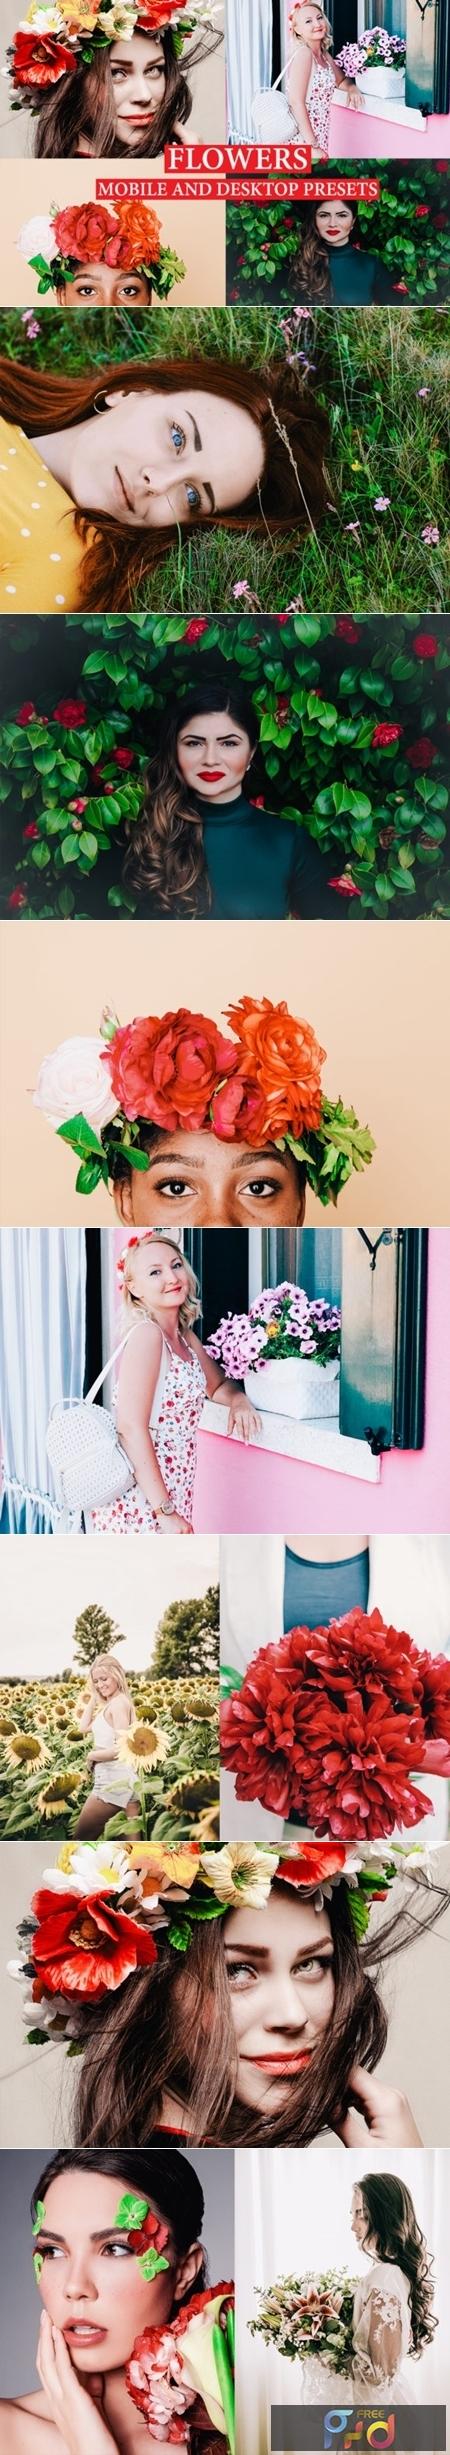 FLOWERS Lightroom Presets Premium 2732848 1